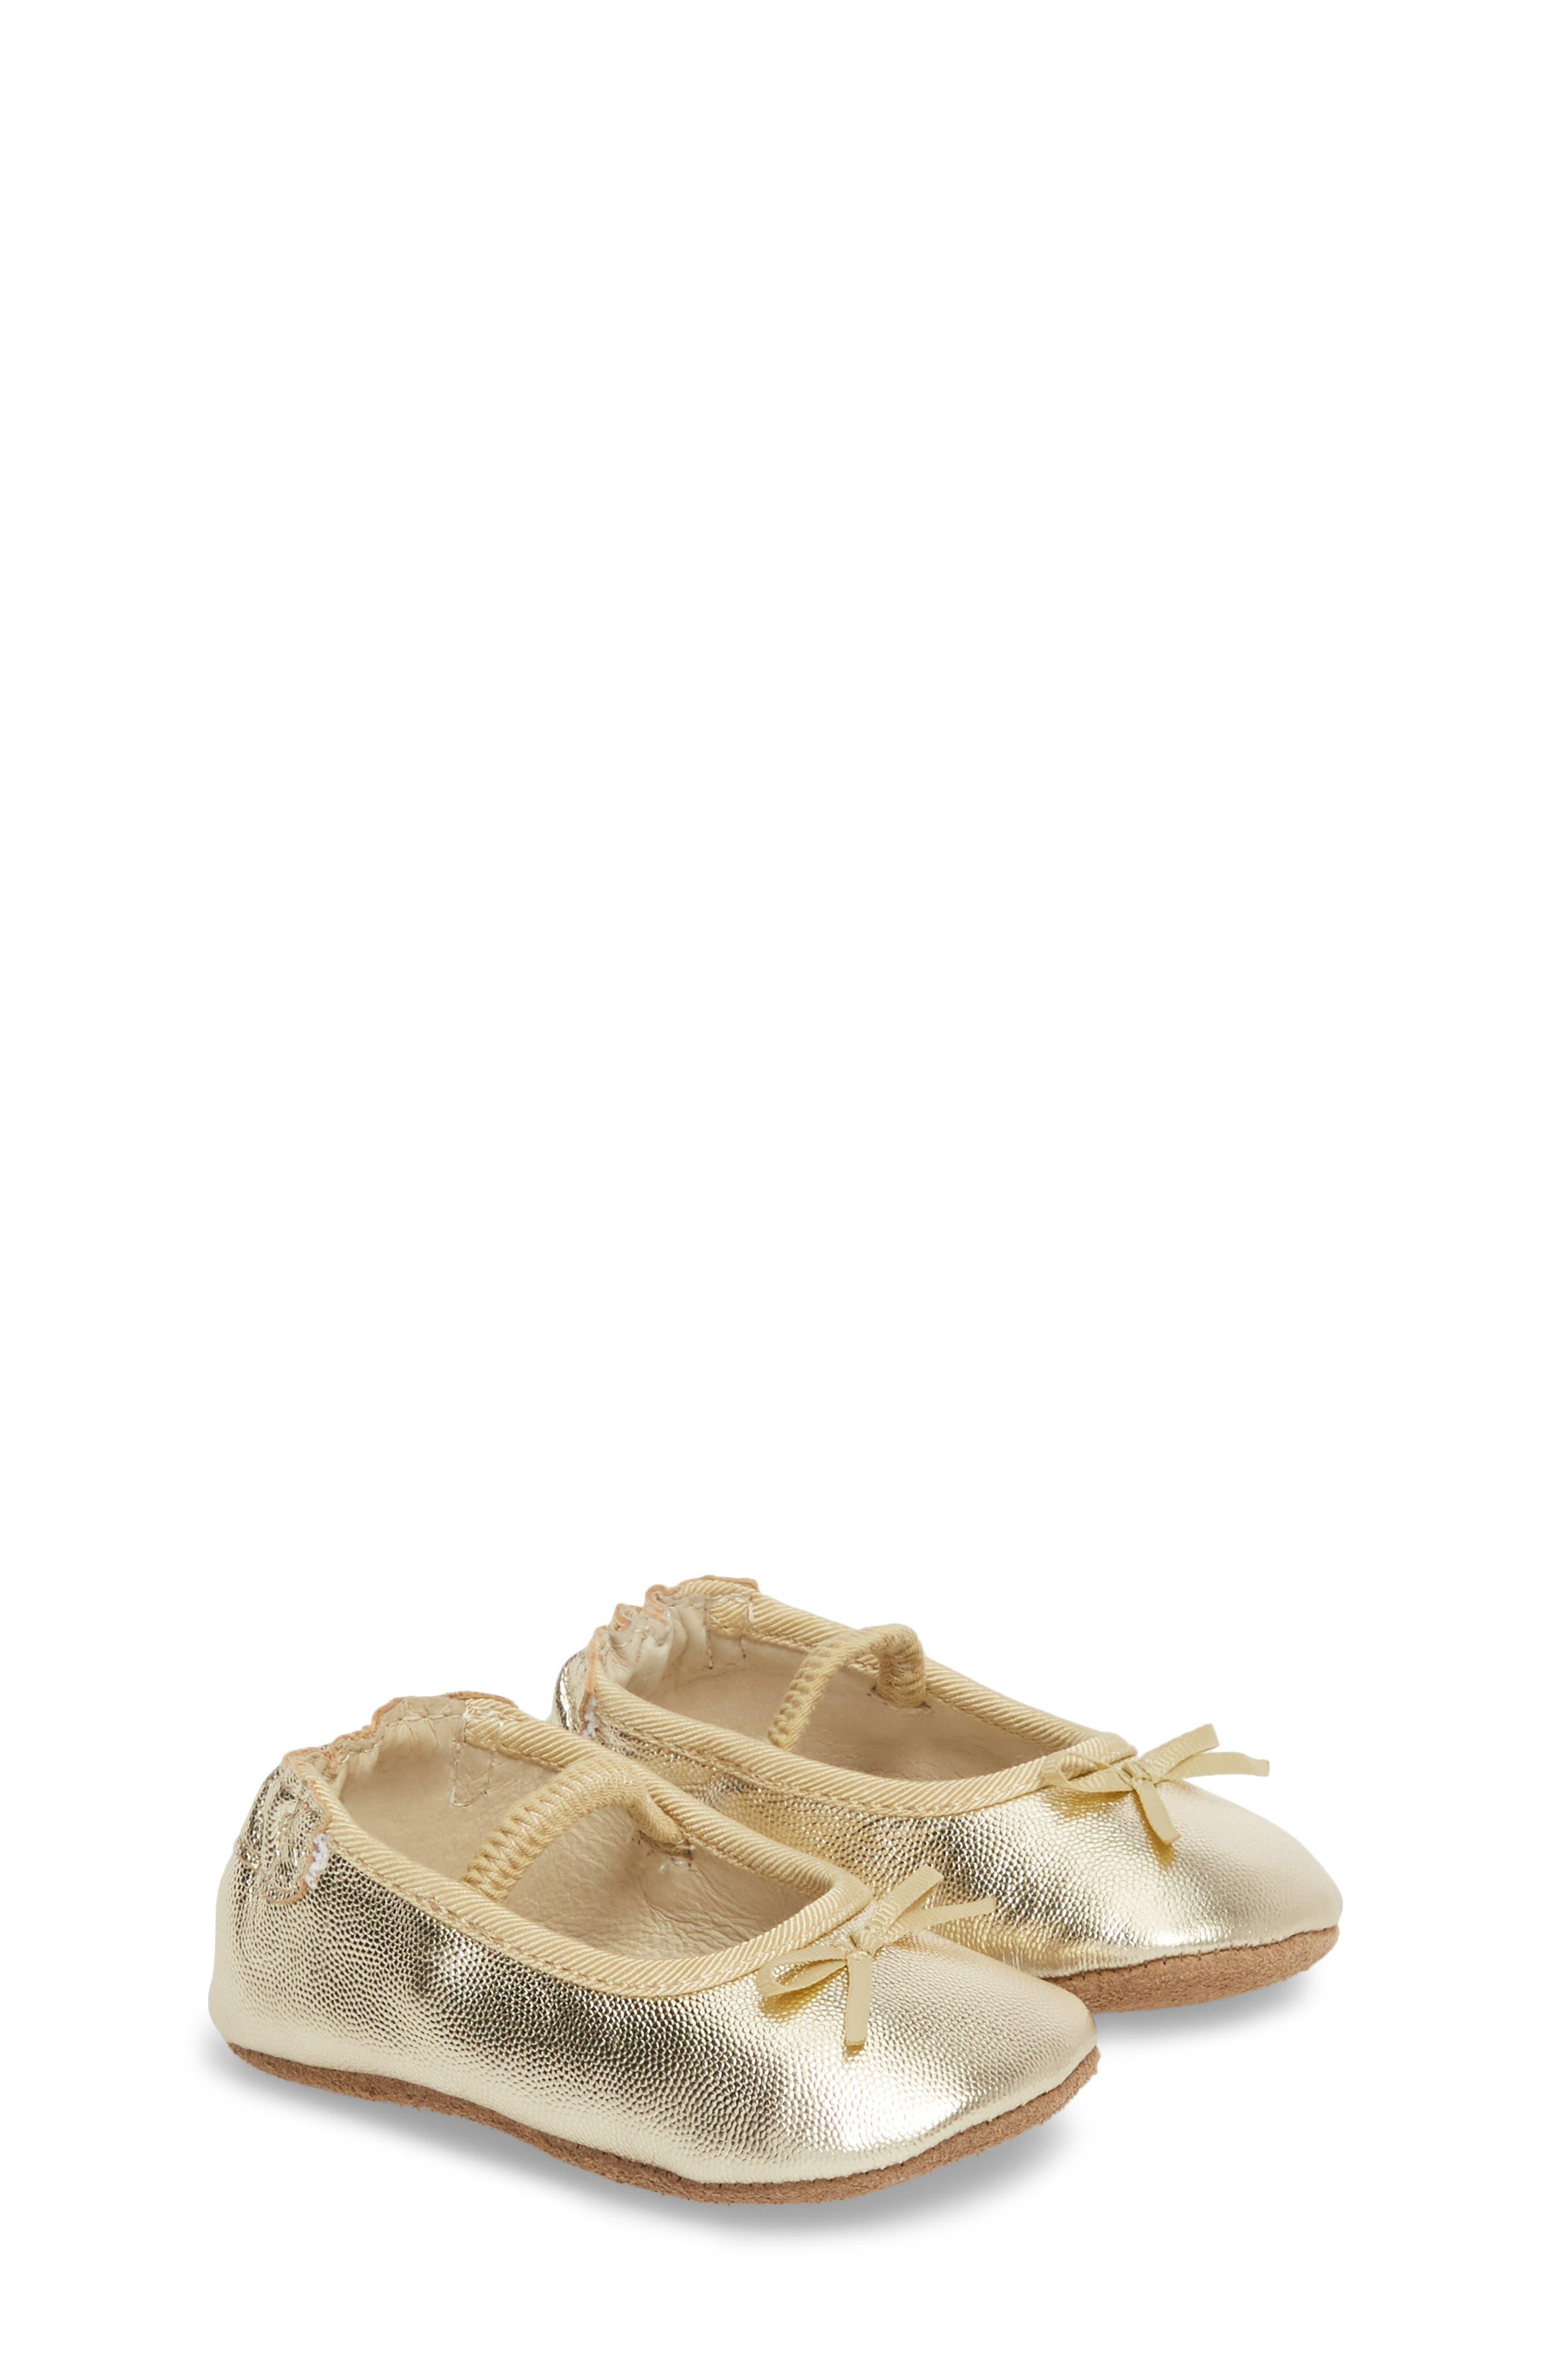 Athena Ballet Strap Crib Shoe,                             Main thumbnail 1, color,                             GOLD